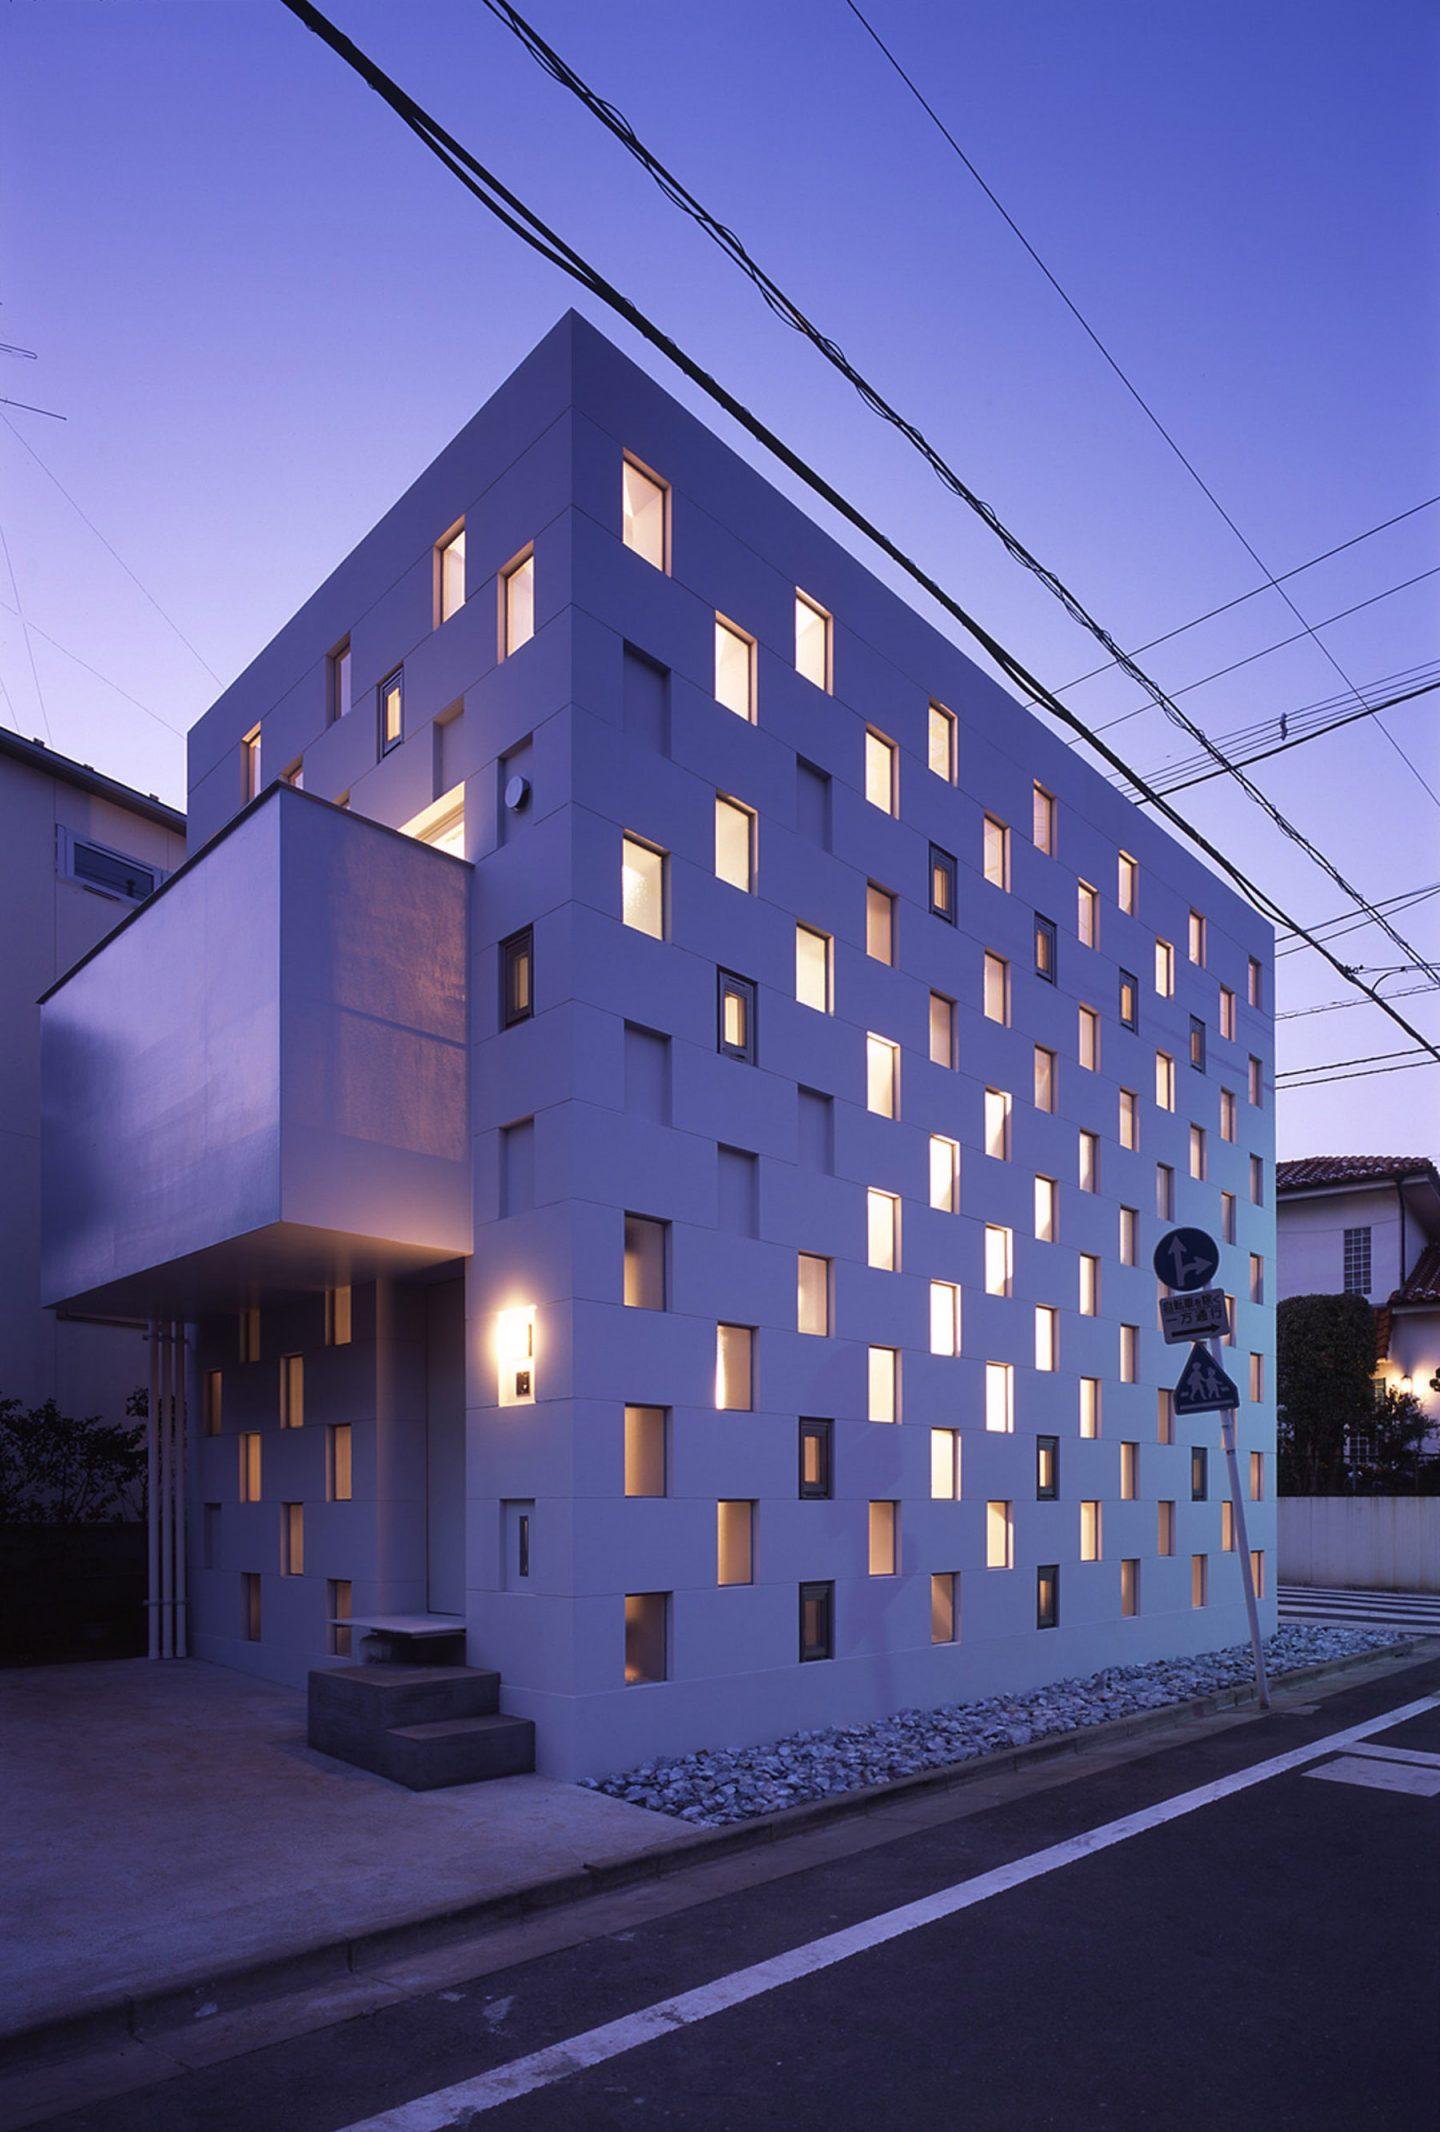 iGNANT-Architecture-Tekuto-Cell-Bars-15